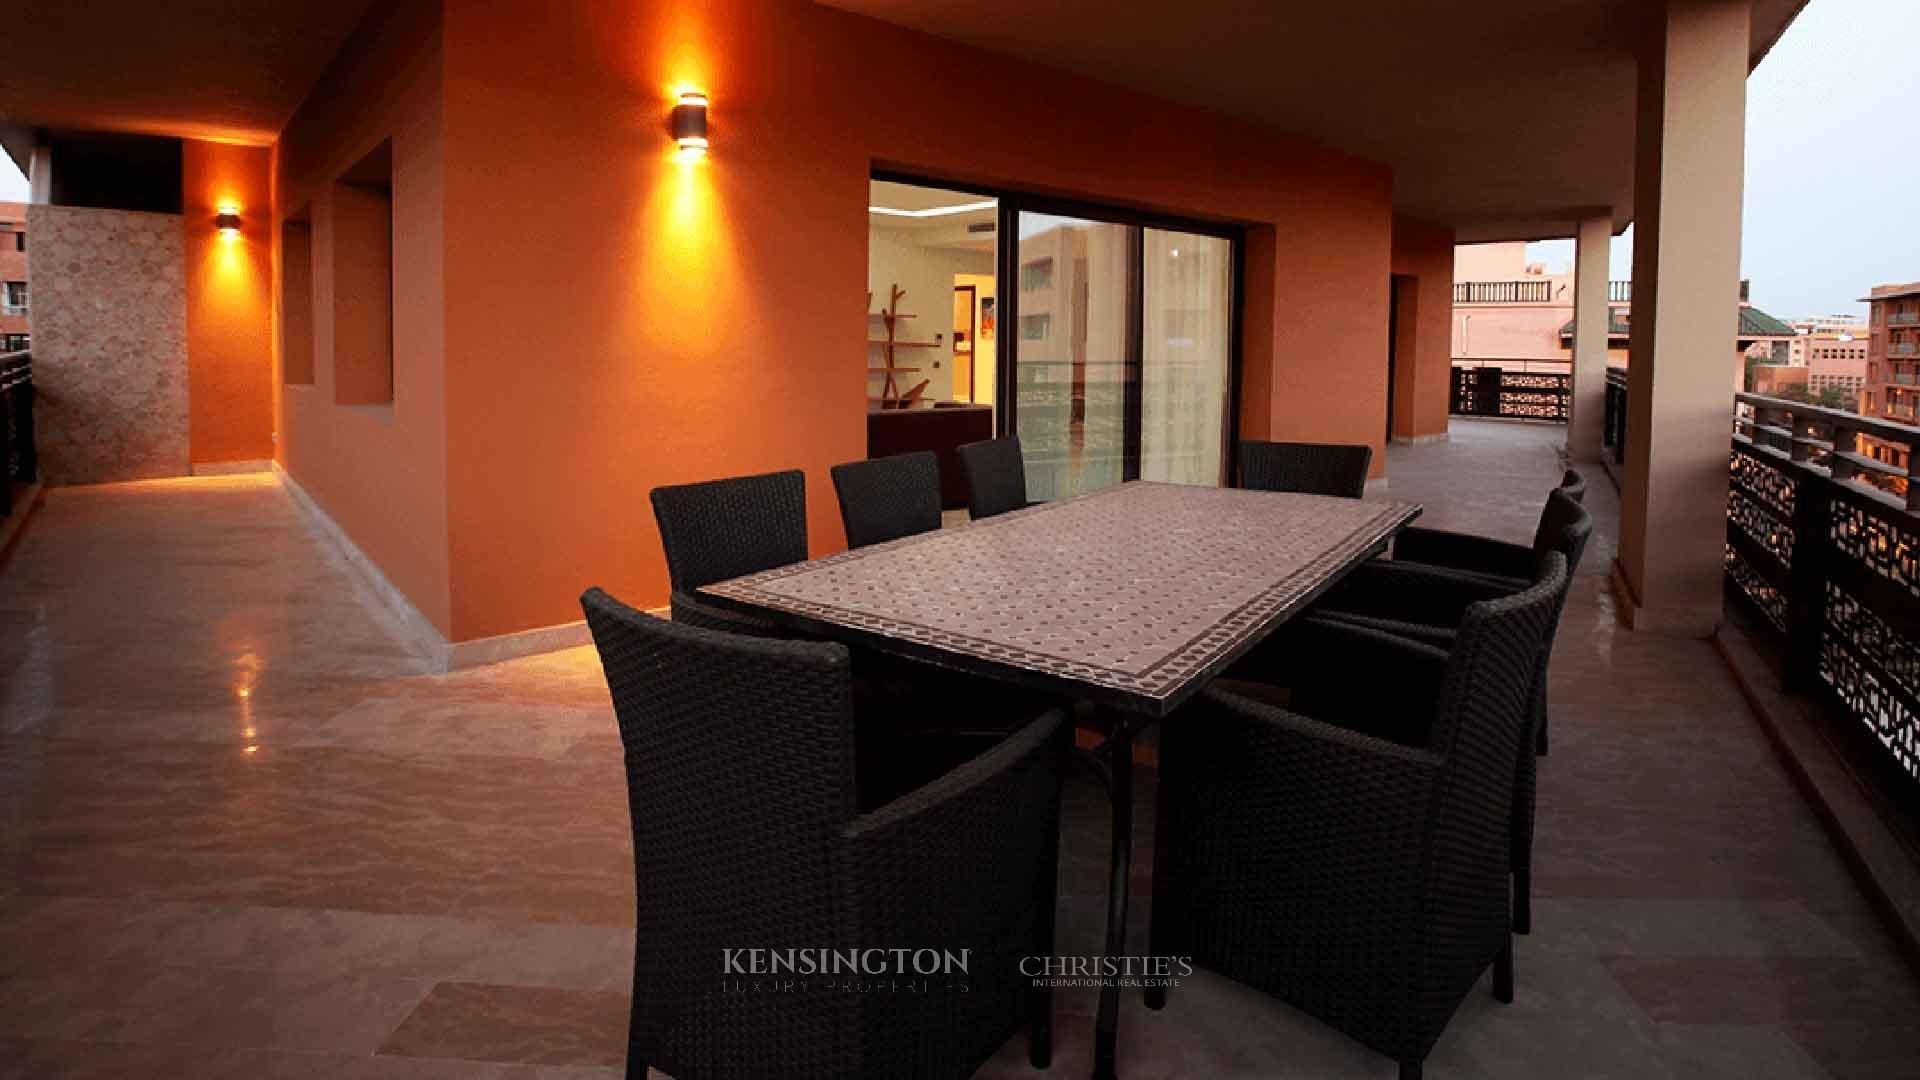 KPPM01312: Apartement Kan Apartment Marrakech Morocco